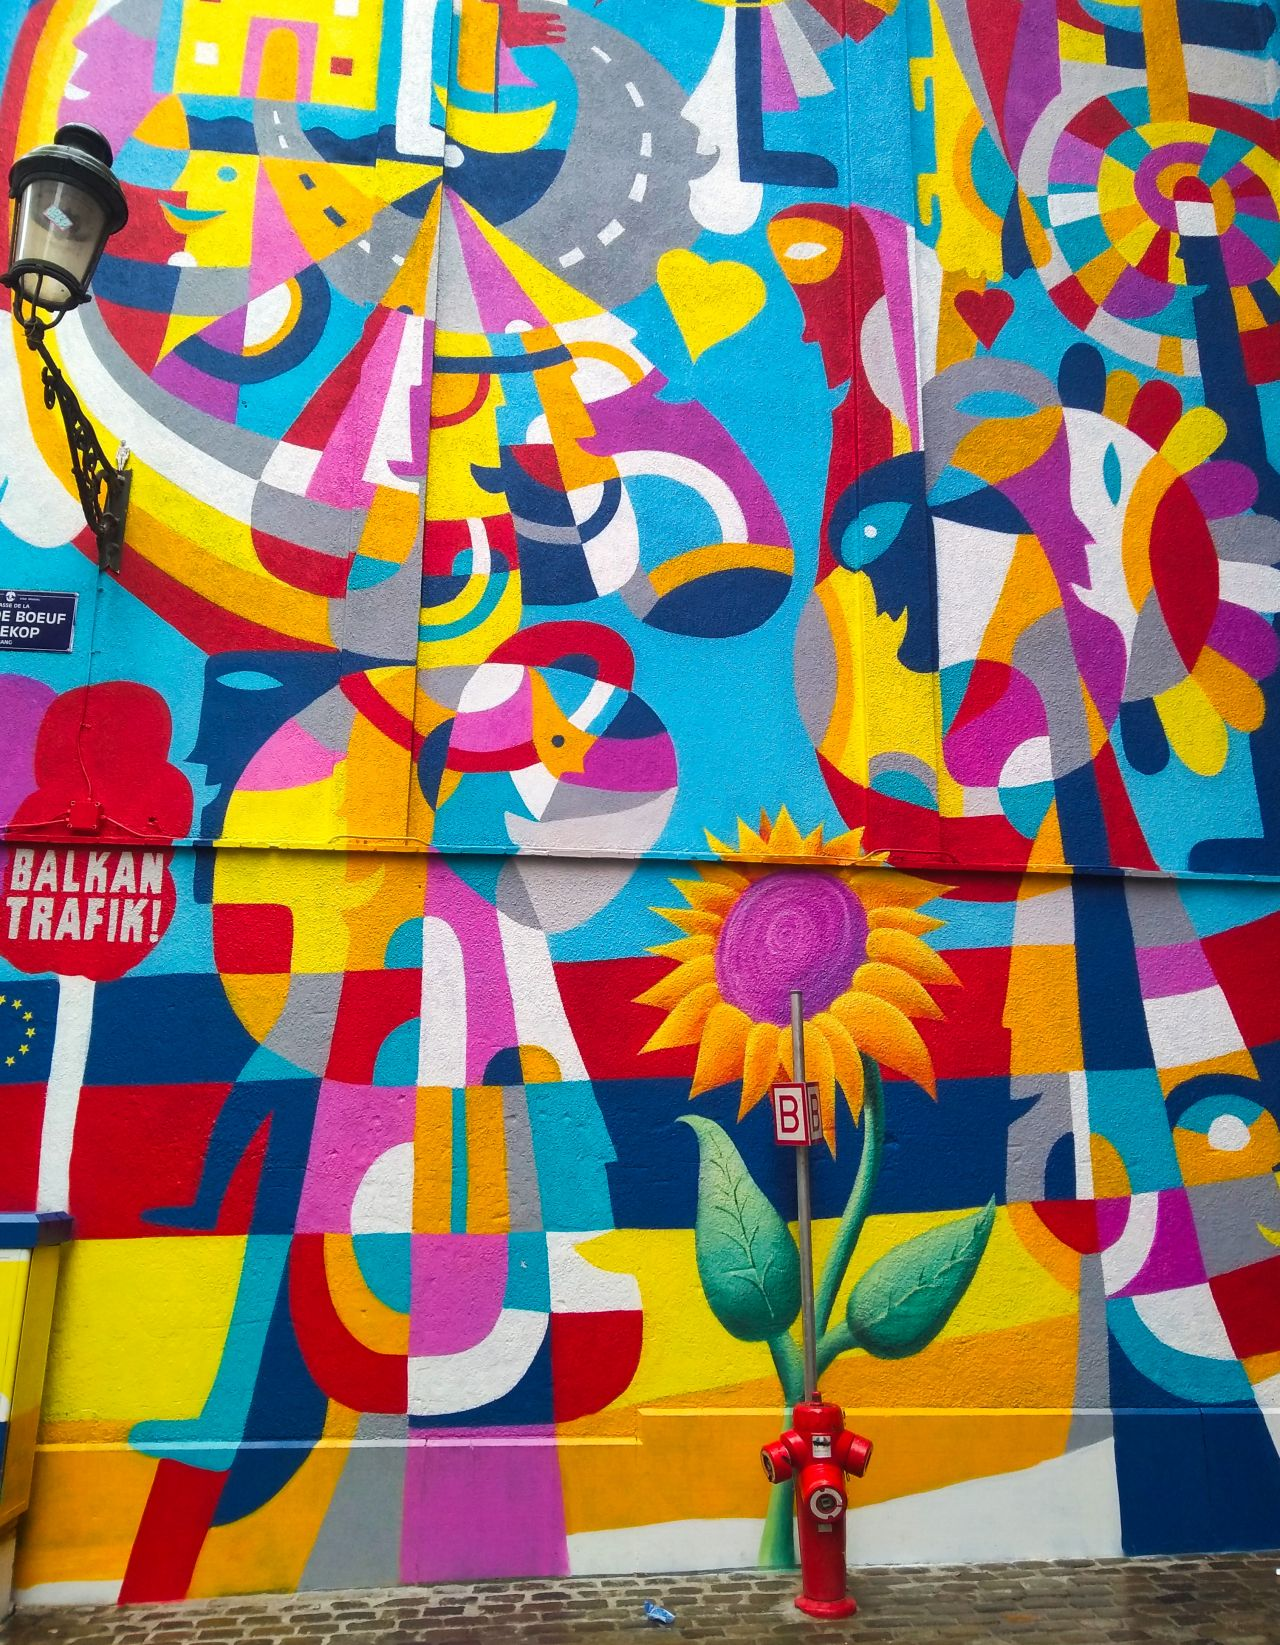 Brussel streetart3